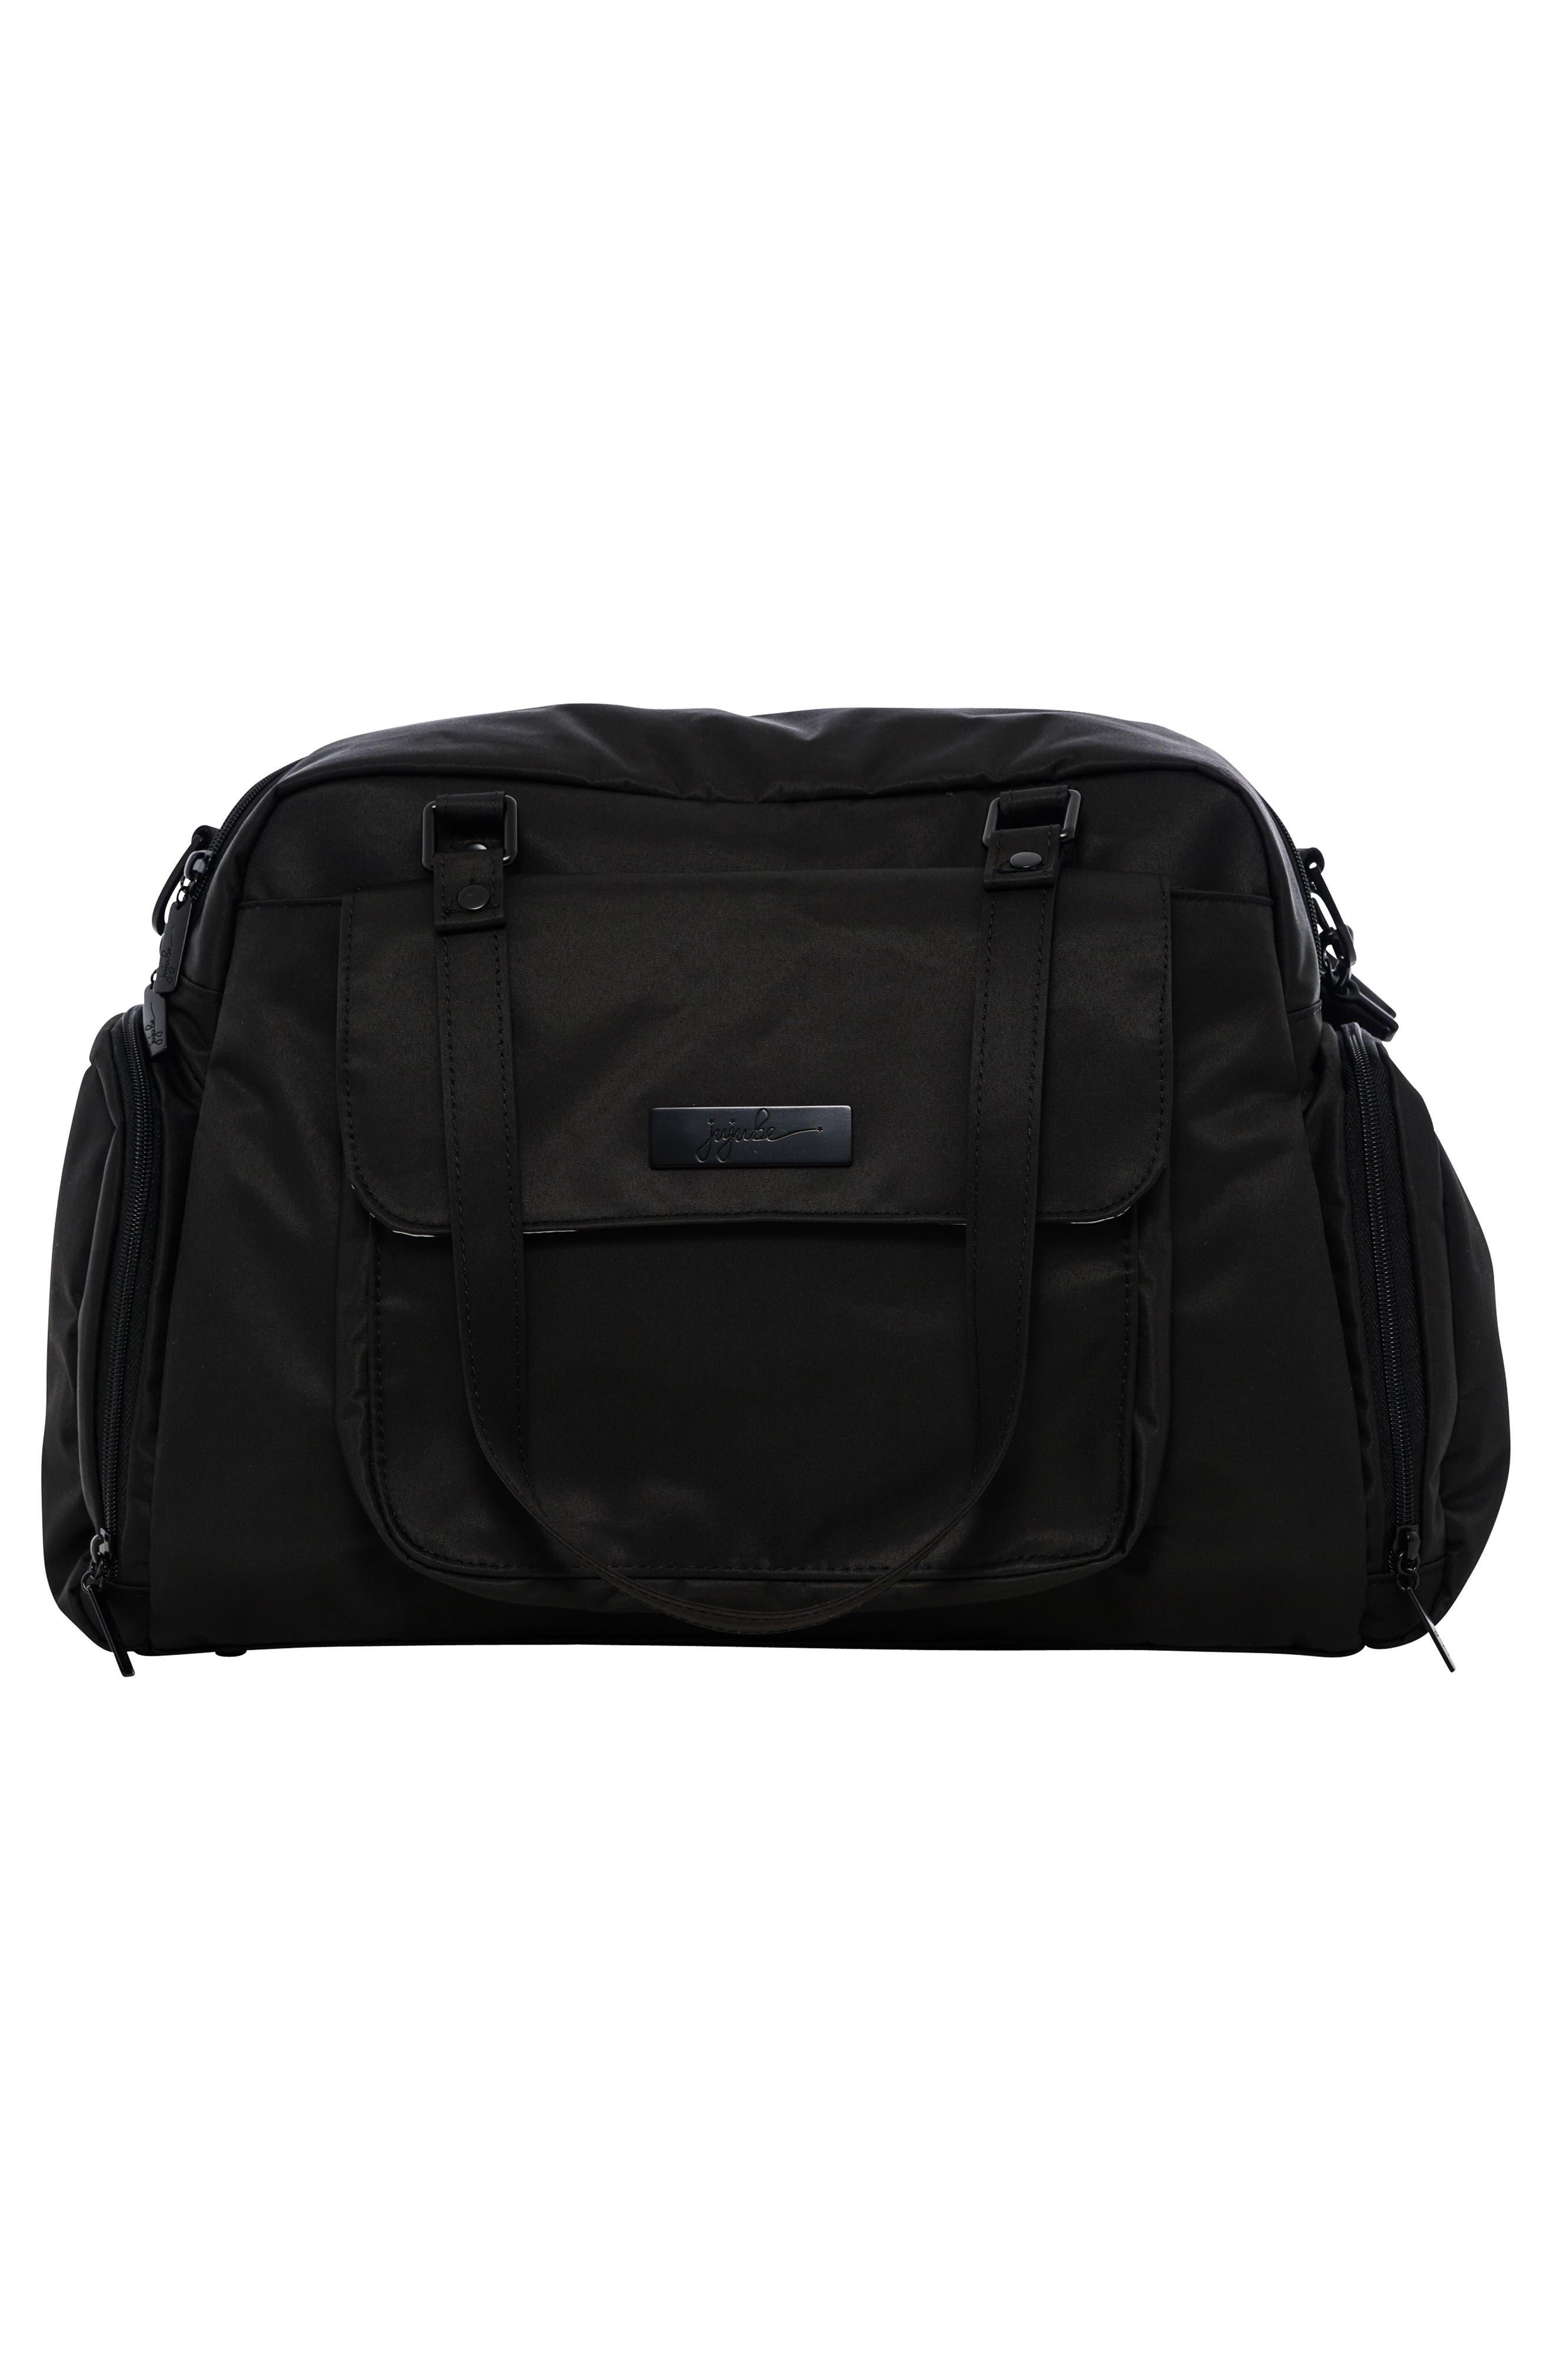 Onyx Be Pumped Bag,                             Alternate thumbnail 7, color,                             BLACK OUT